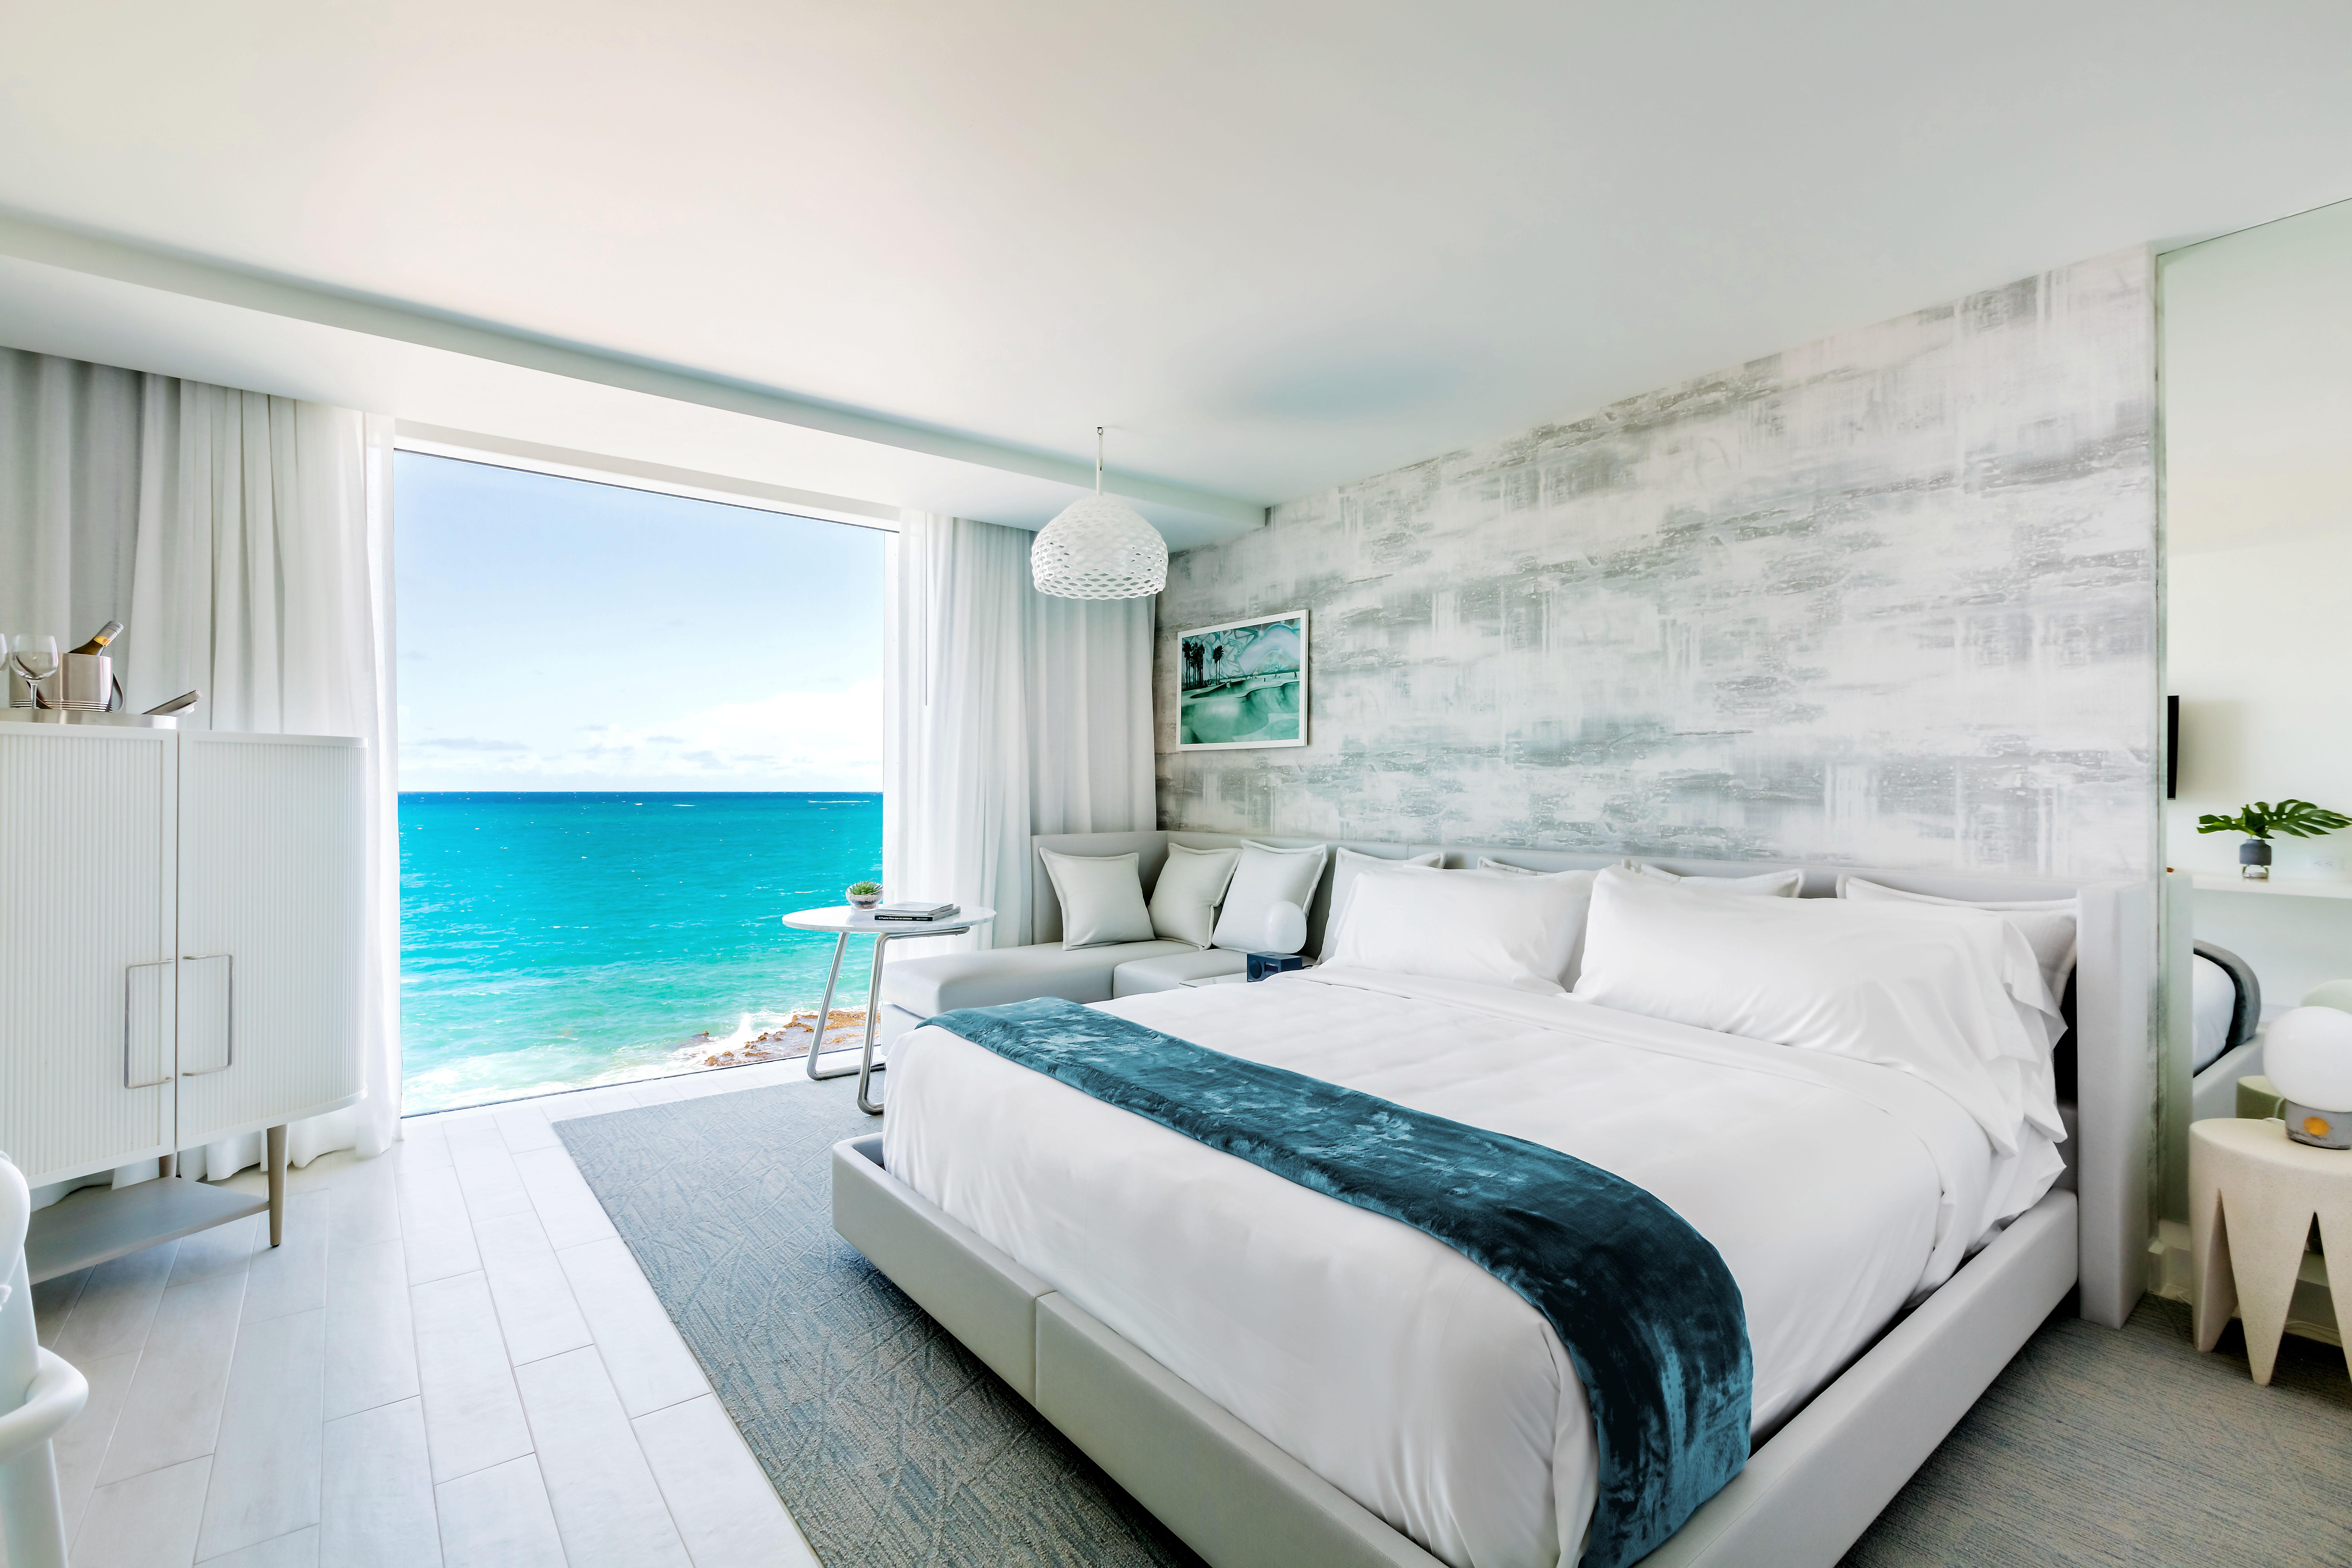 city meets beach hotel serafina beach room bed view